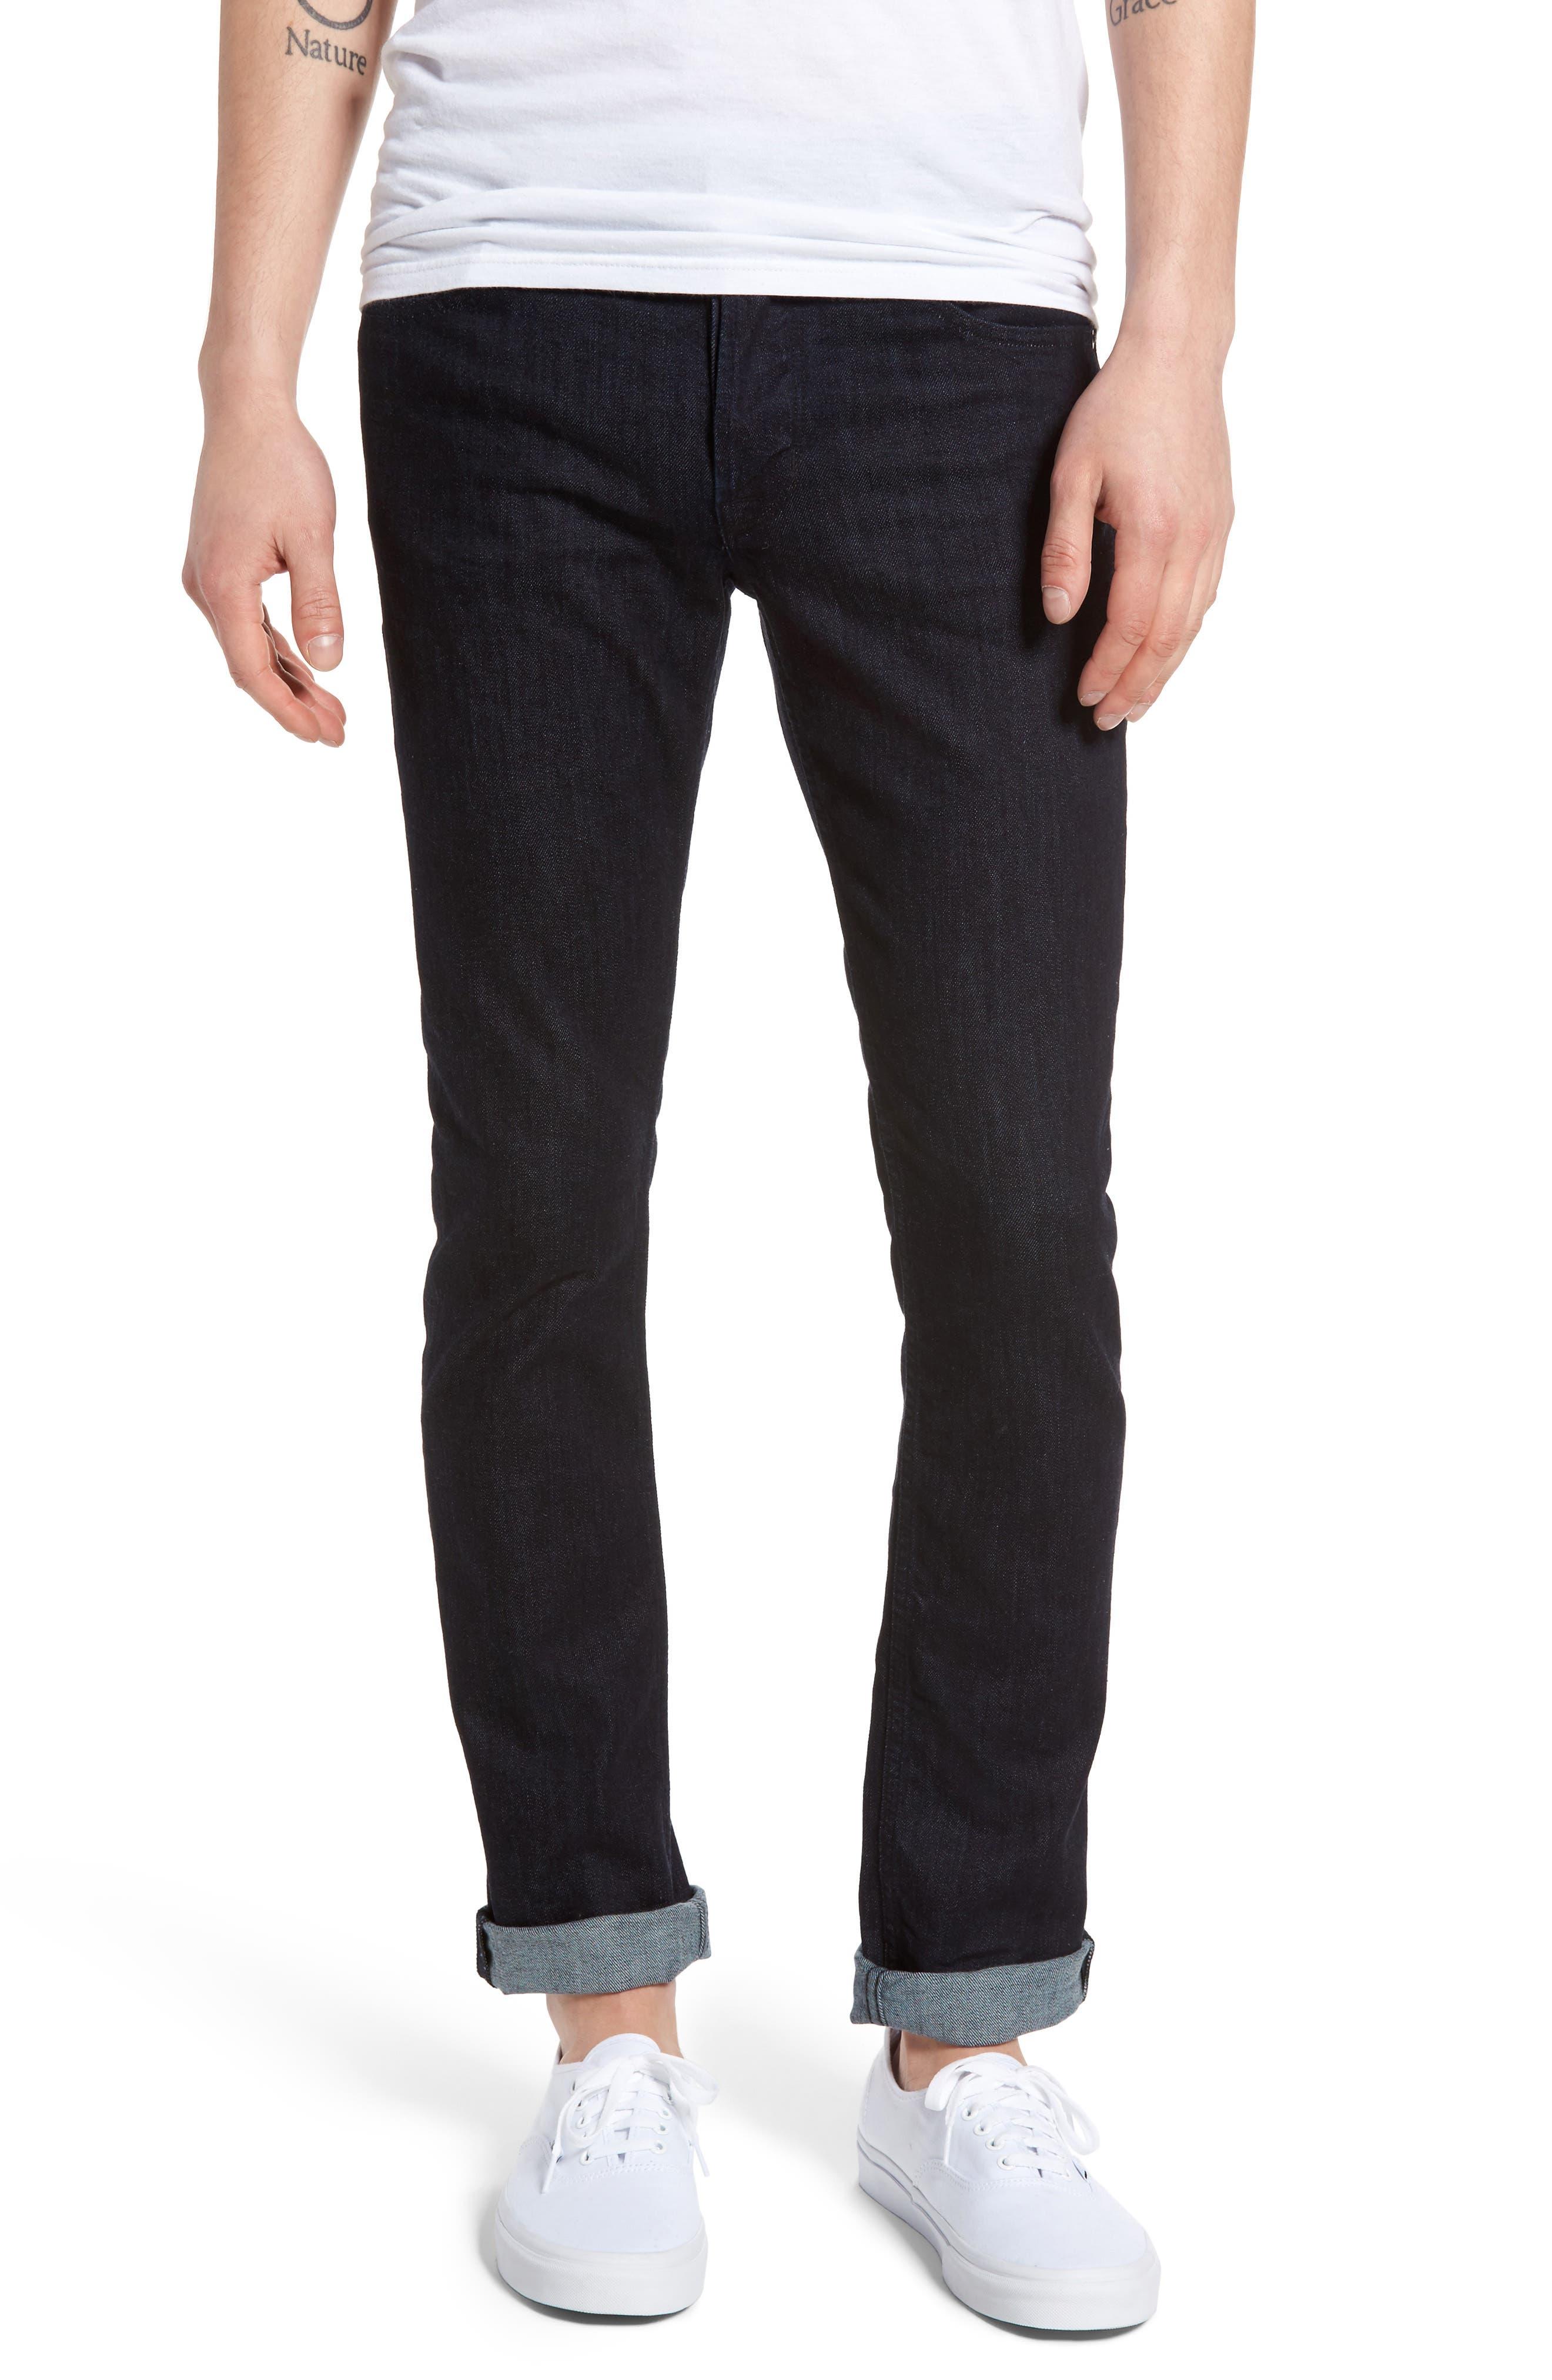 Hudson Jeans Axl Skinny Fit Jeans (Firestone)